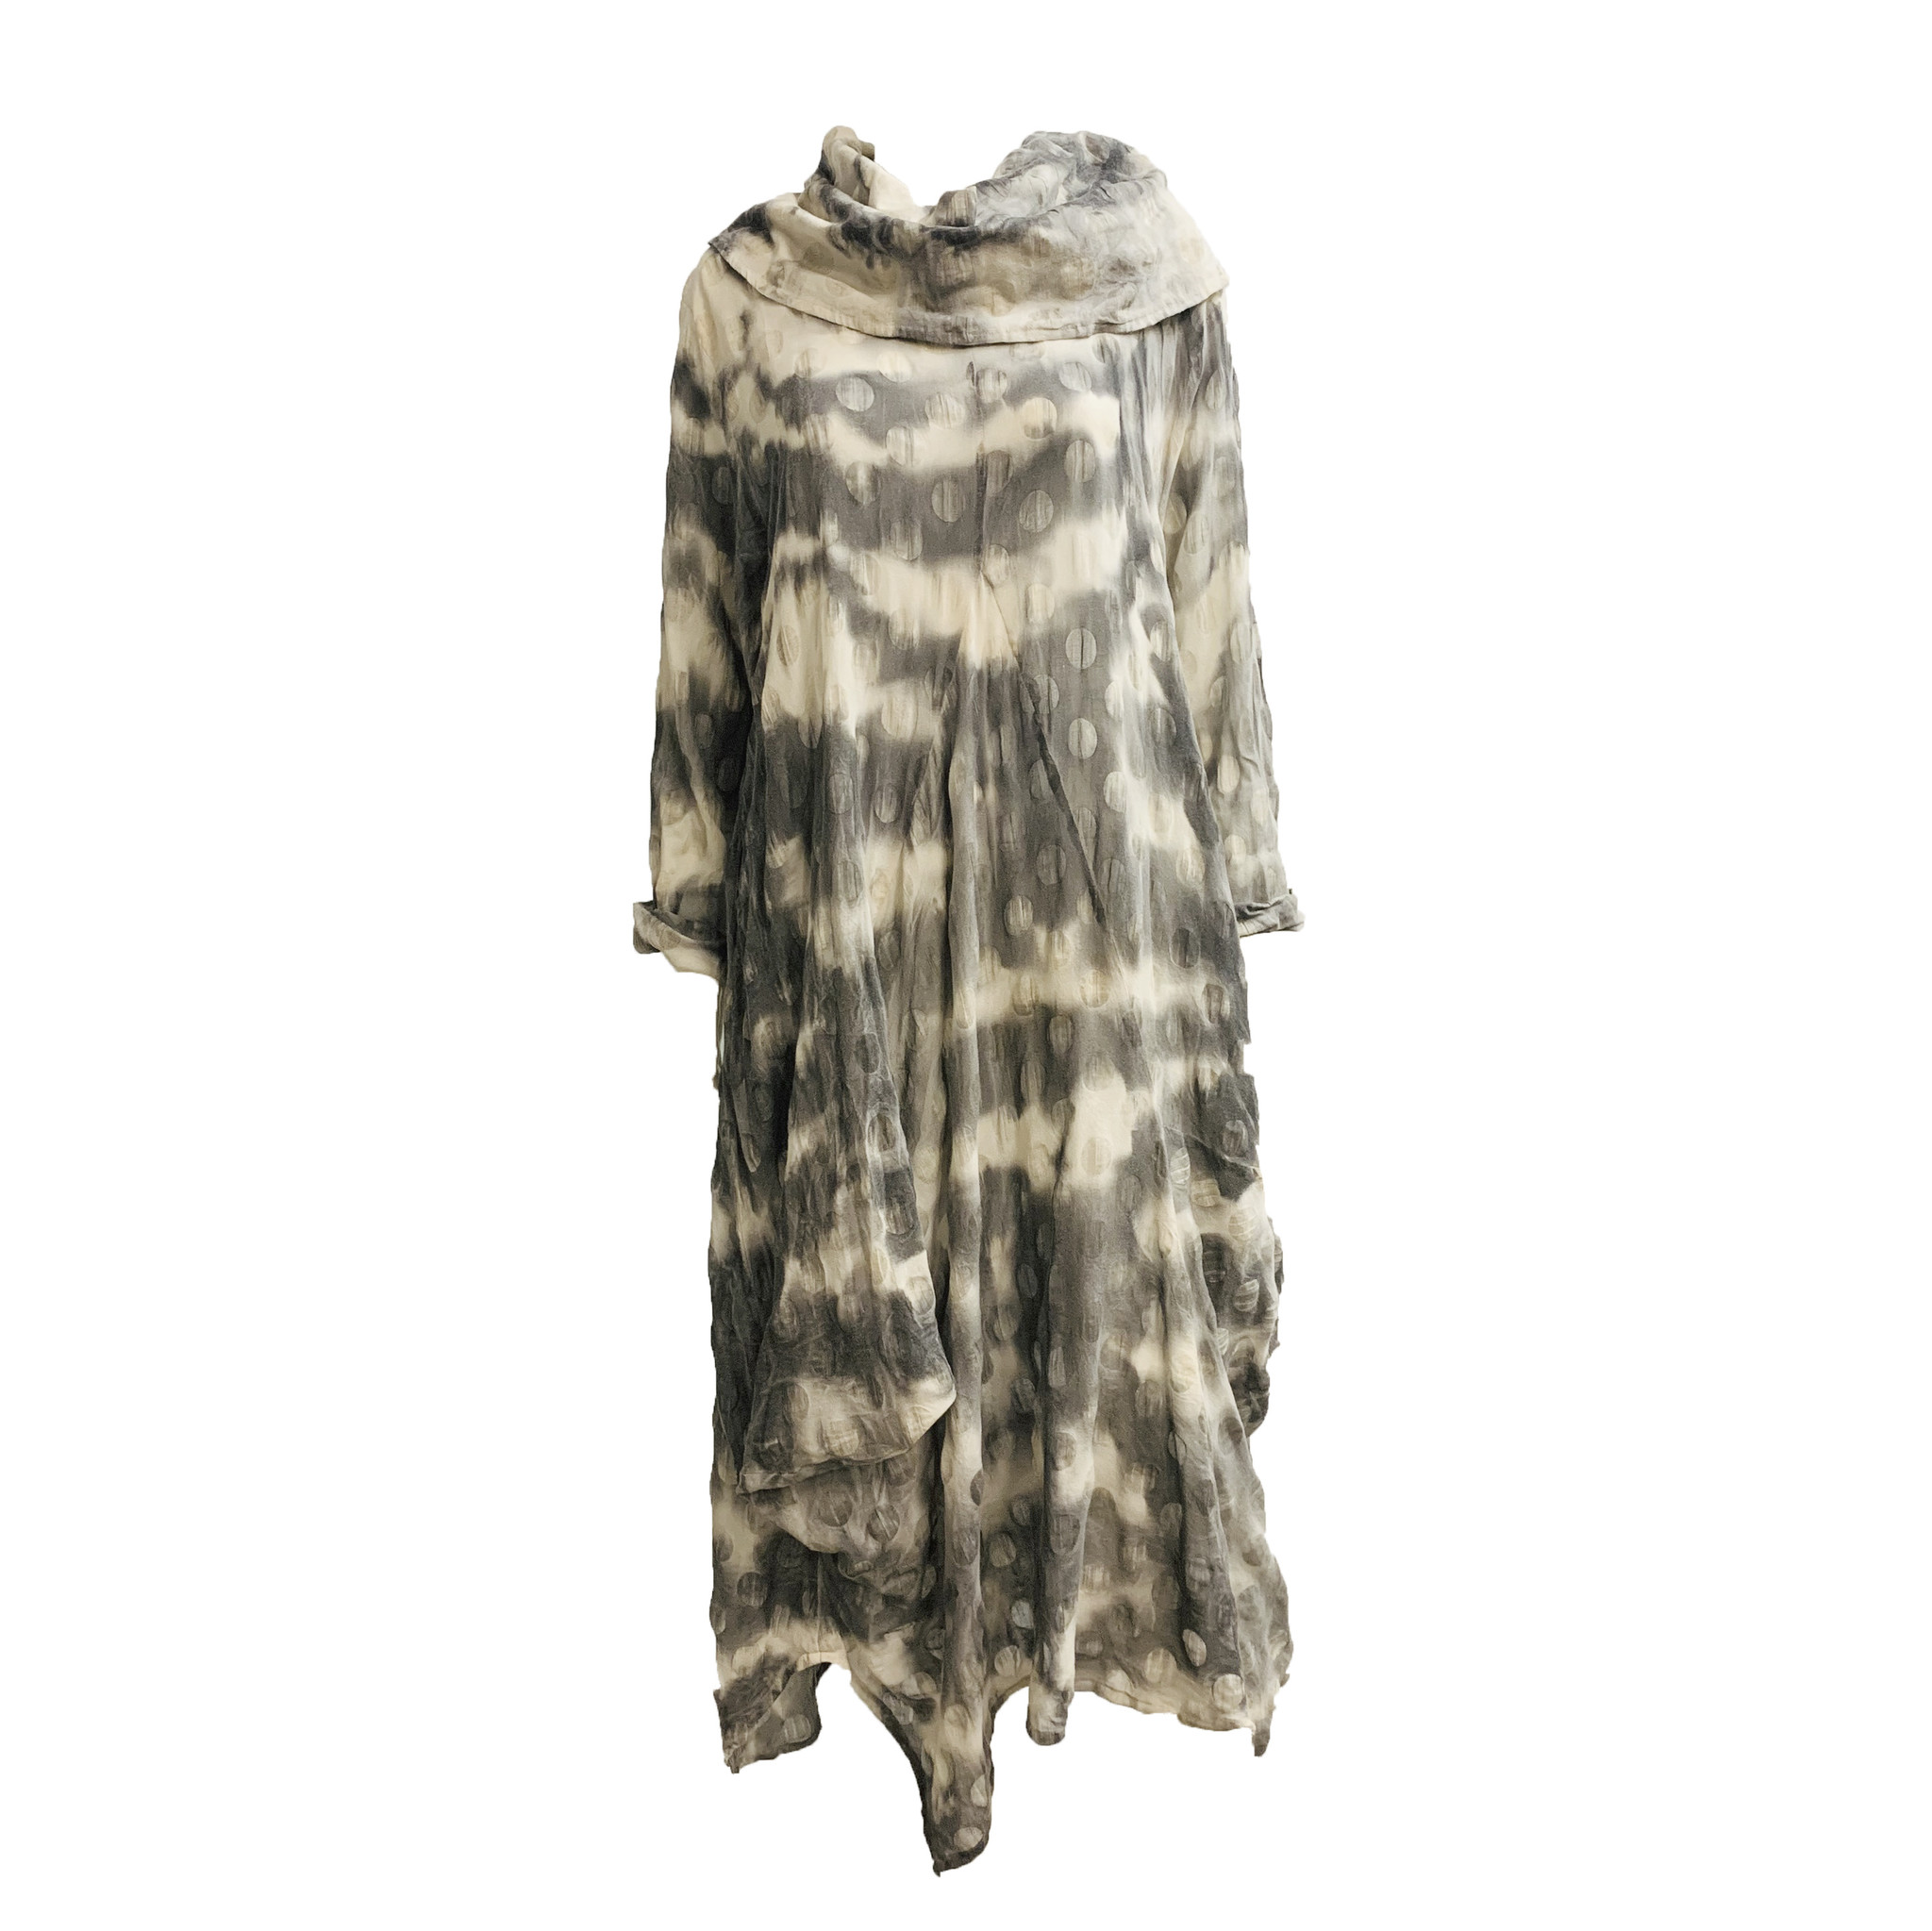 Dress To Kill Dress To Kill Scrunch Fan Dress Black O/S